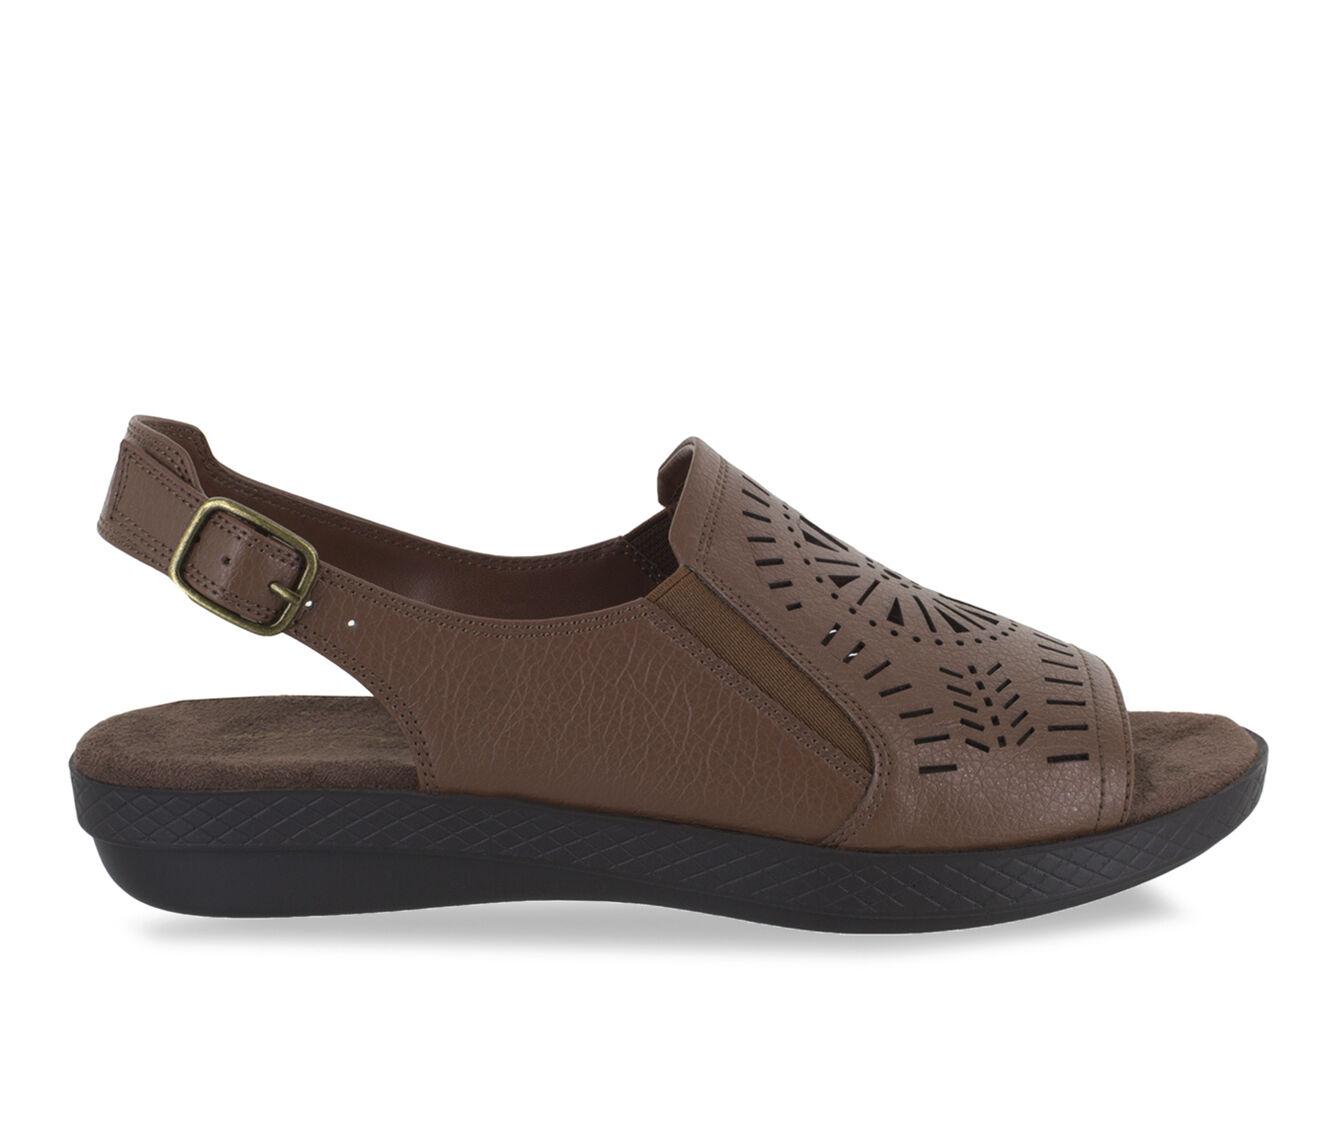 Women's Easy Street Rose Sandals Tan